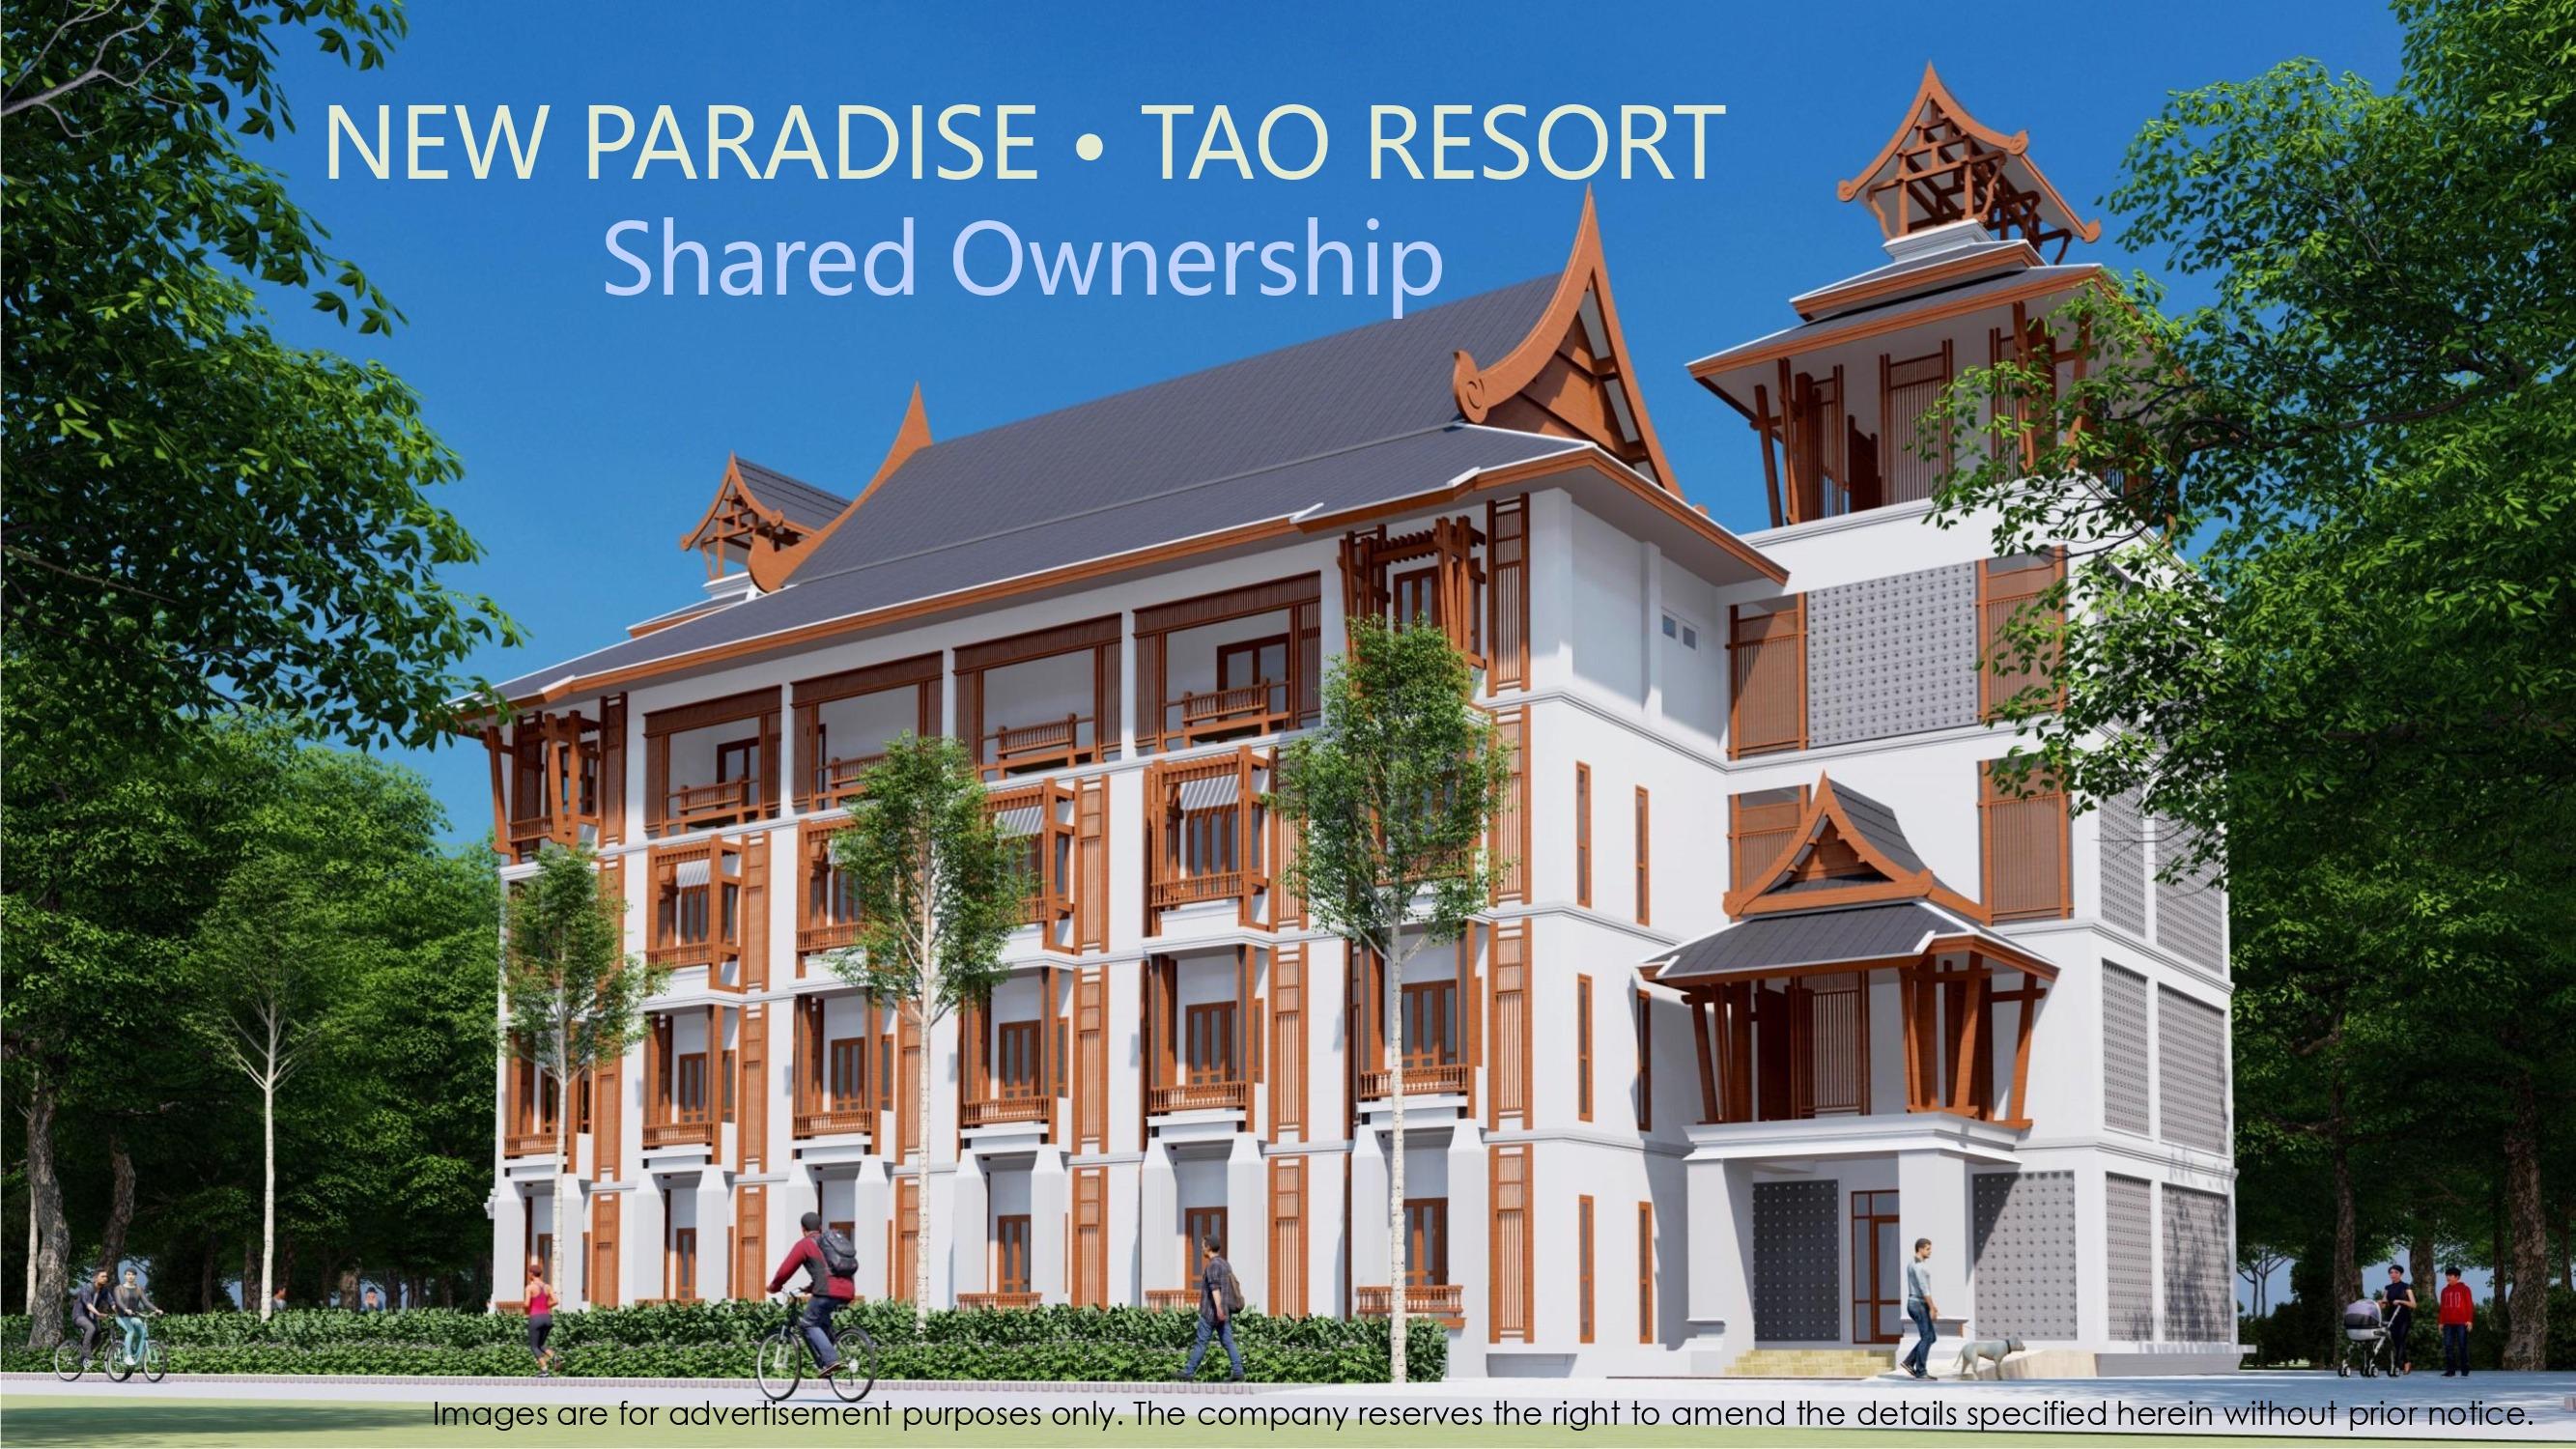 Tao Resort and Darkroom Technology